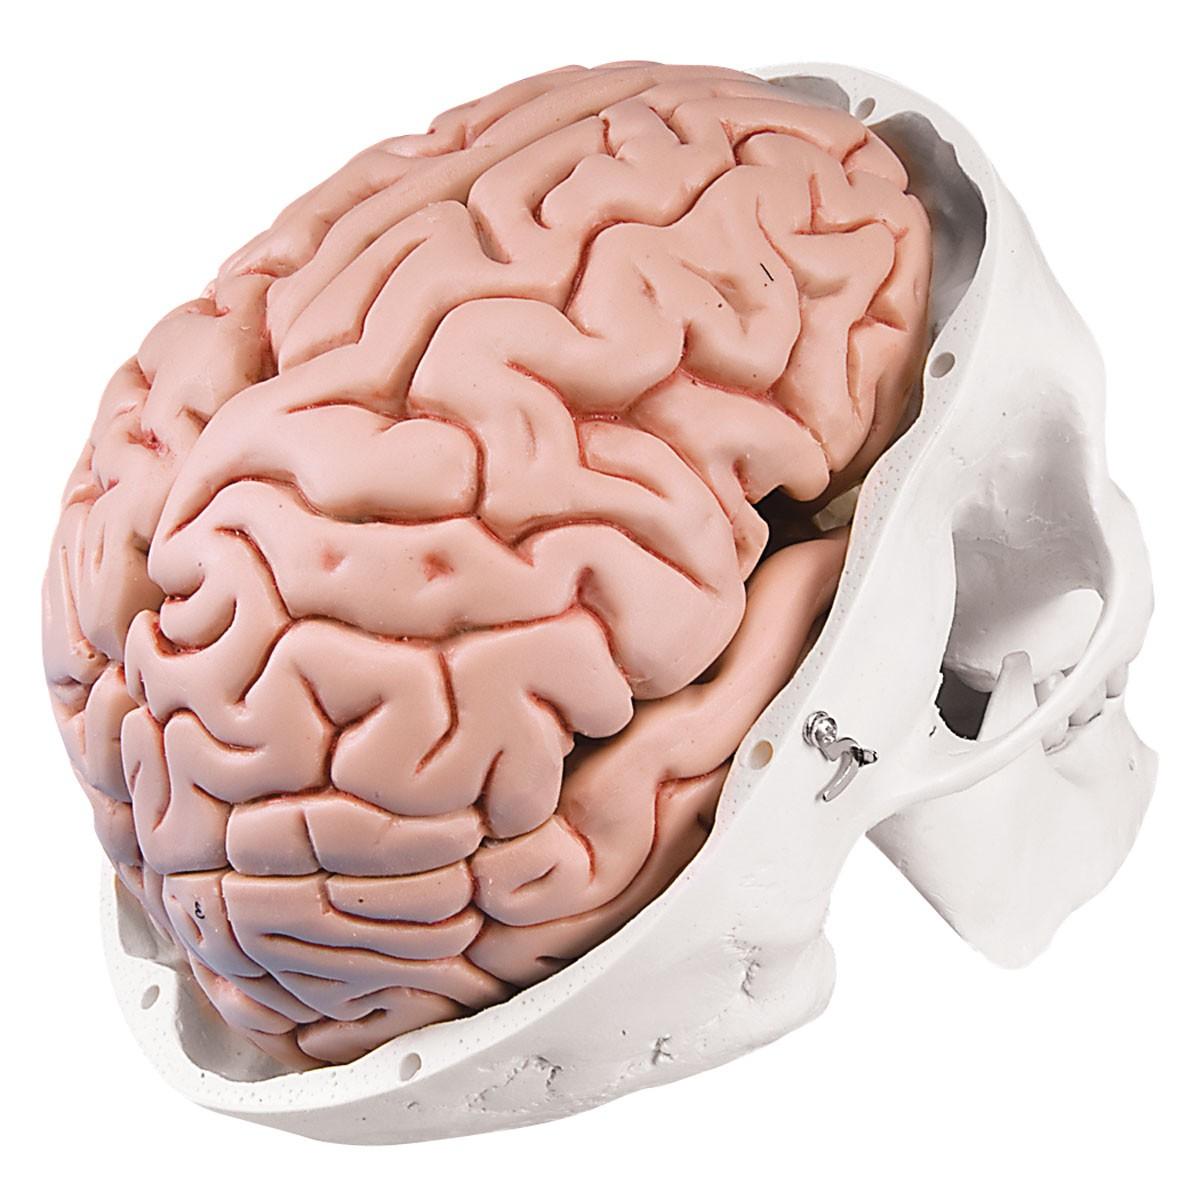 Klassik-Schädel mit Gehirn, 8-teilig